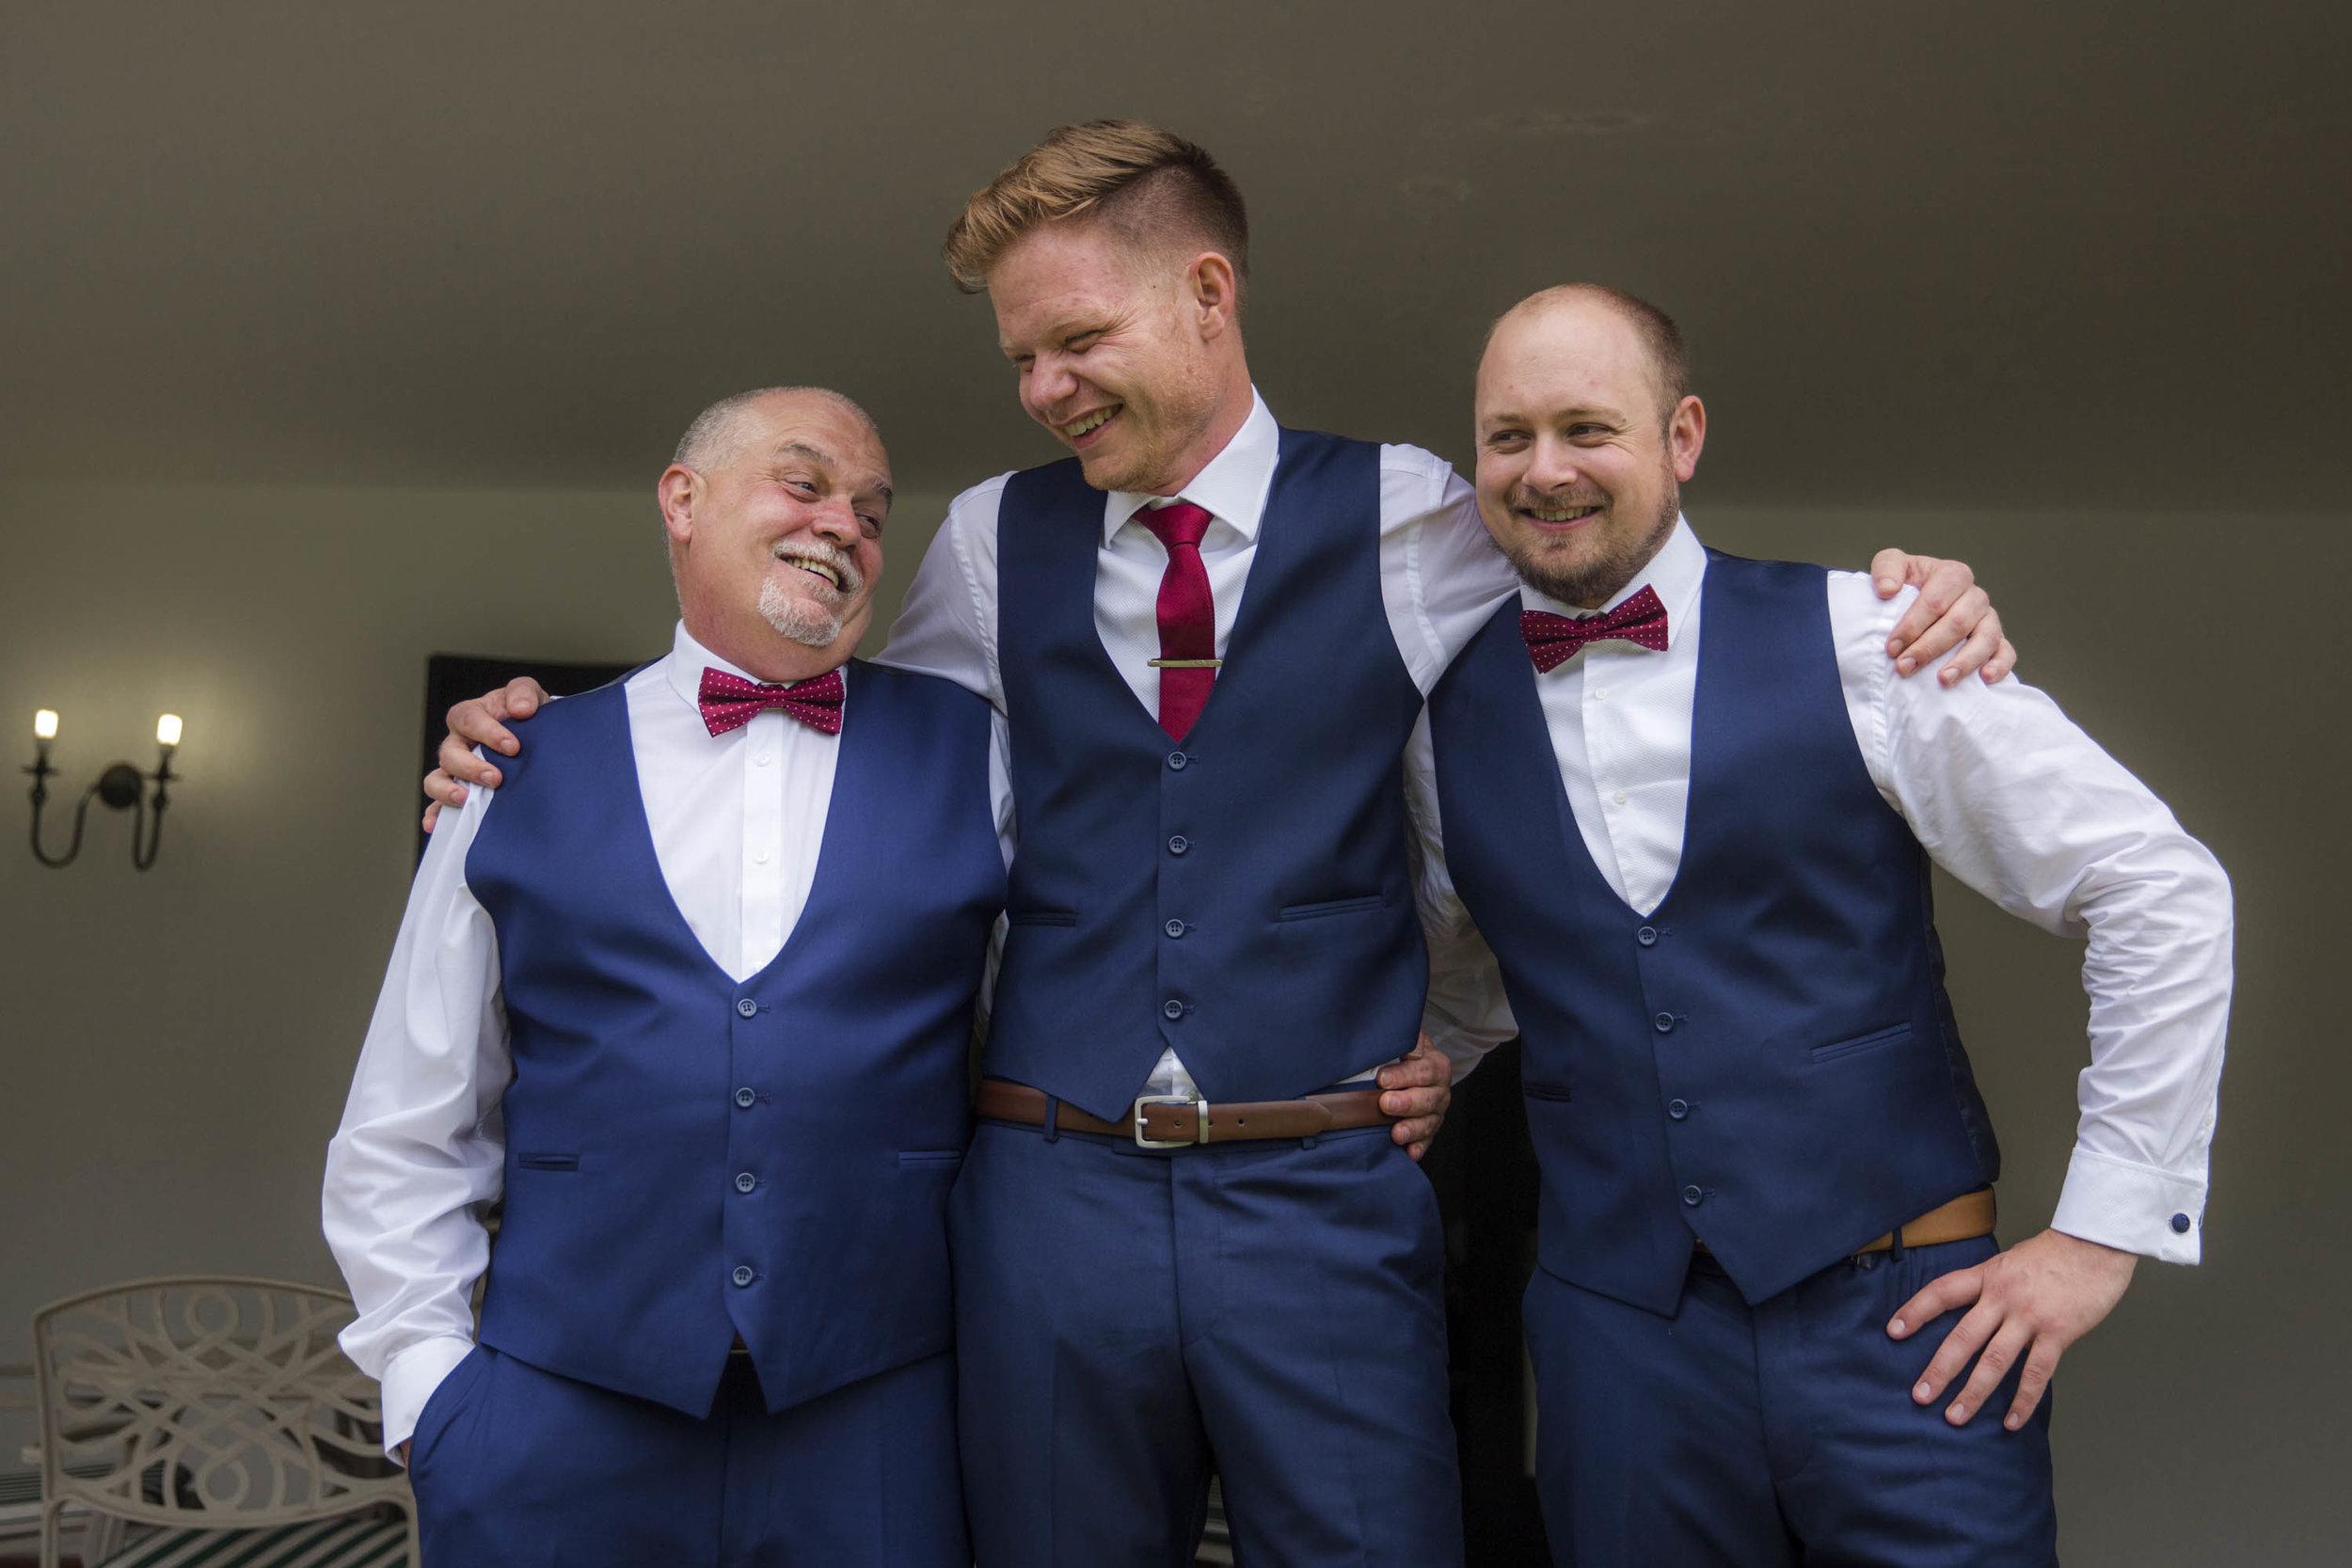 029-johannesburg-wedding-photographers.JPG